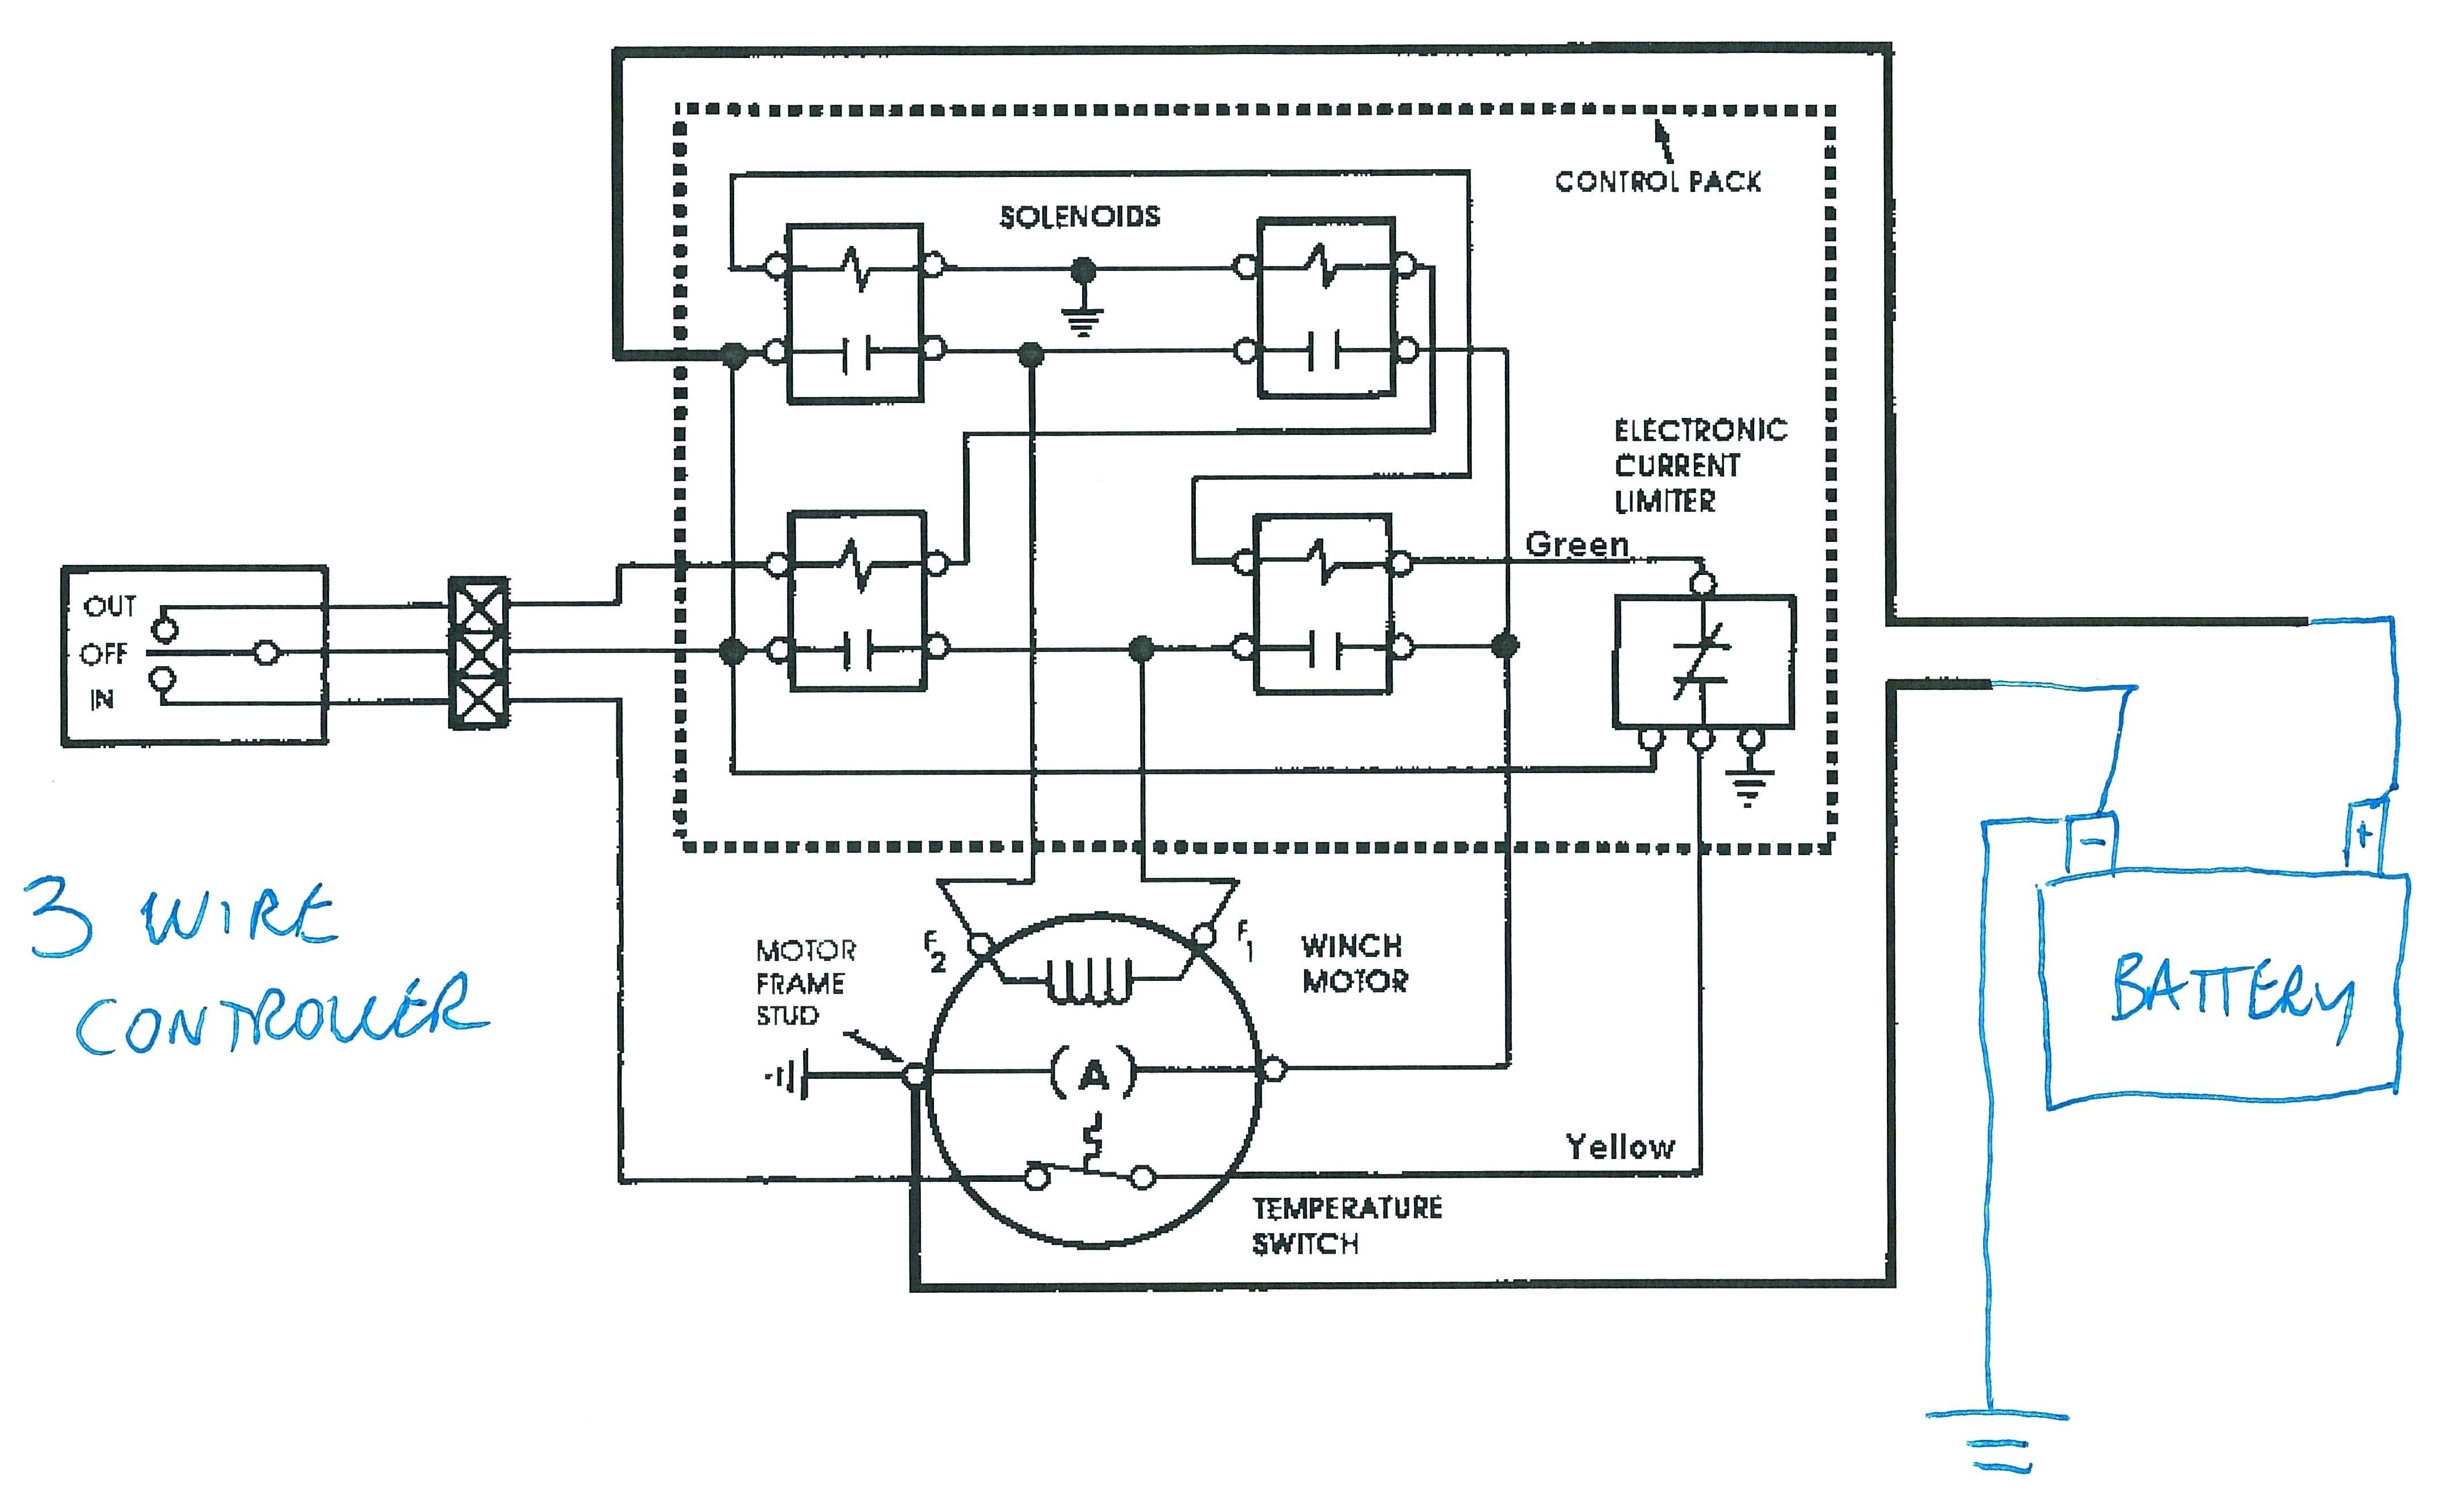 Upright Scissor Lift Wiring Diagram Car Lift Wiring Diagram – Fooddailyub Of Upright Scissor Lift Wiring Diagram